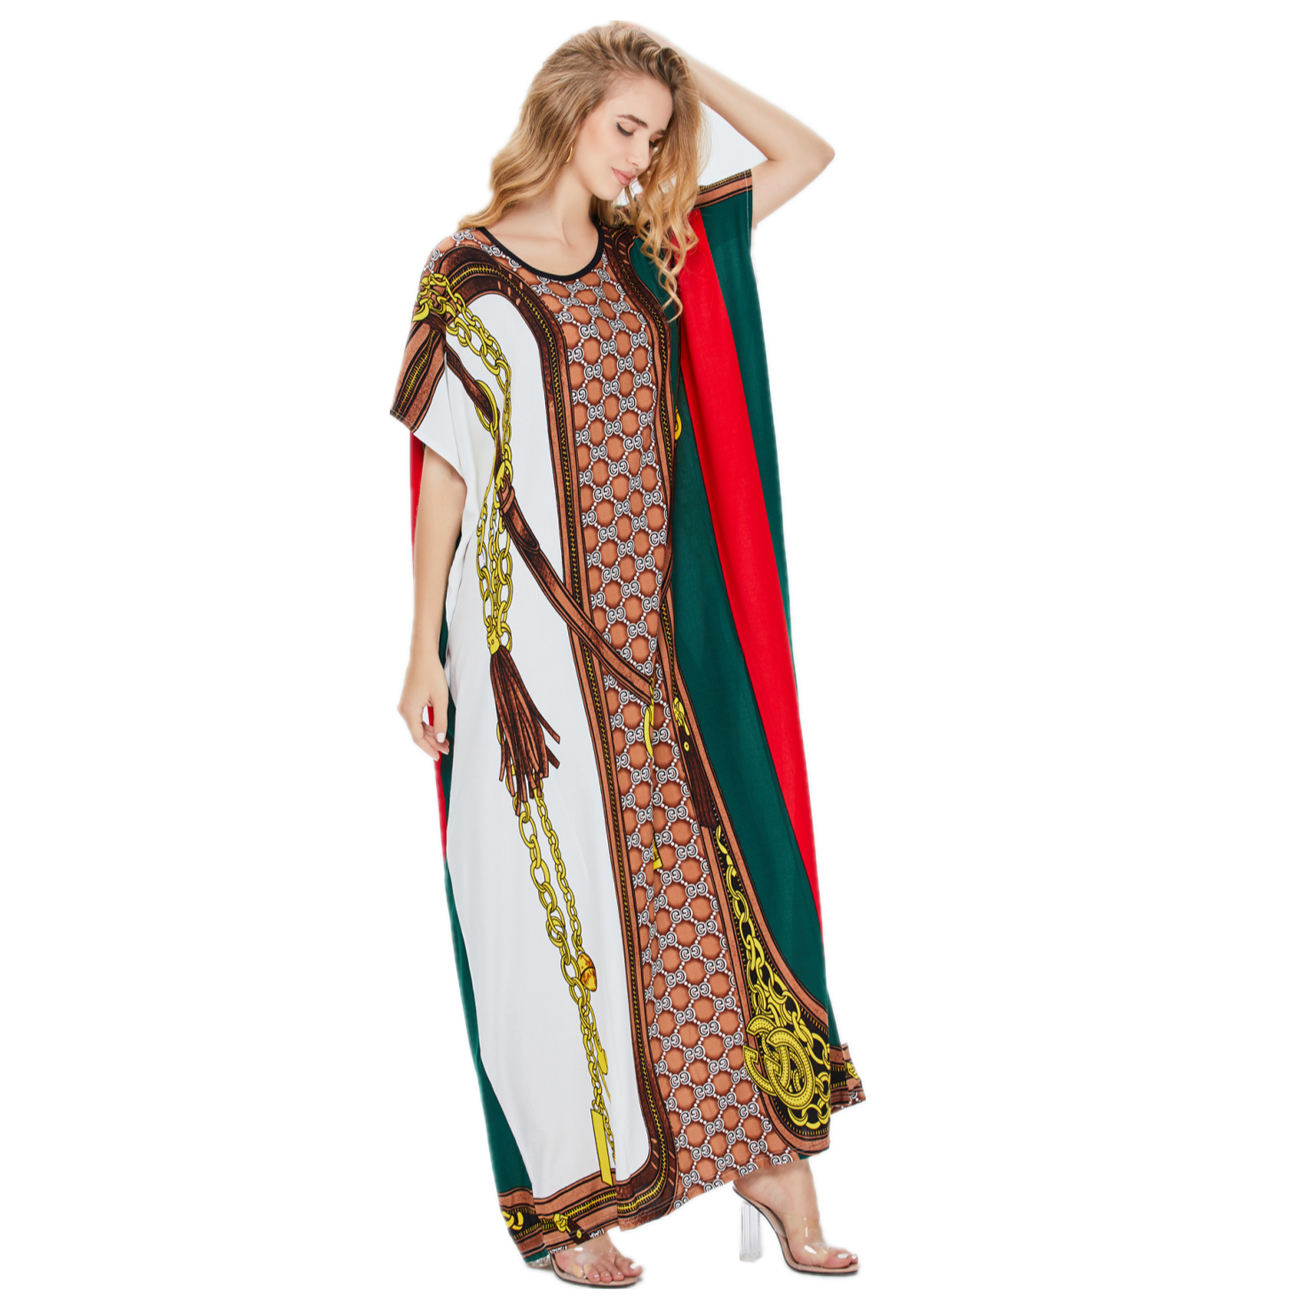 New Arrivals Summer Middle East National Robe soft fashion women islam Kaftan moroccan Muslim Dress